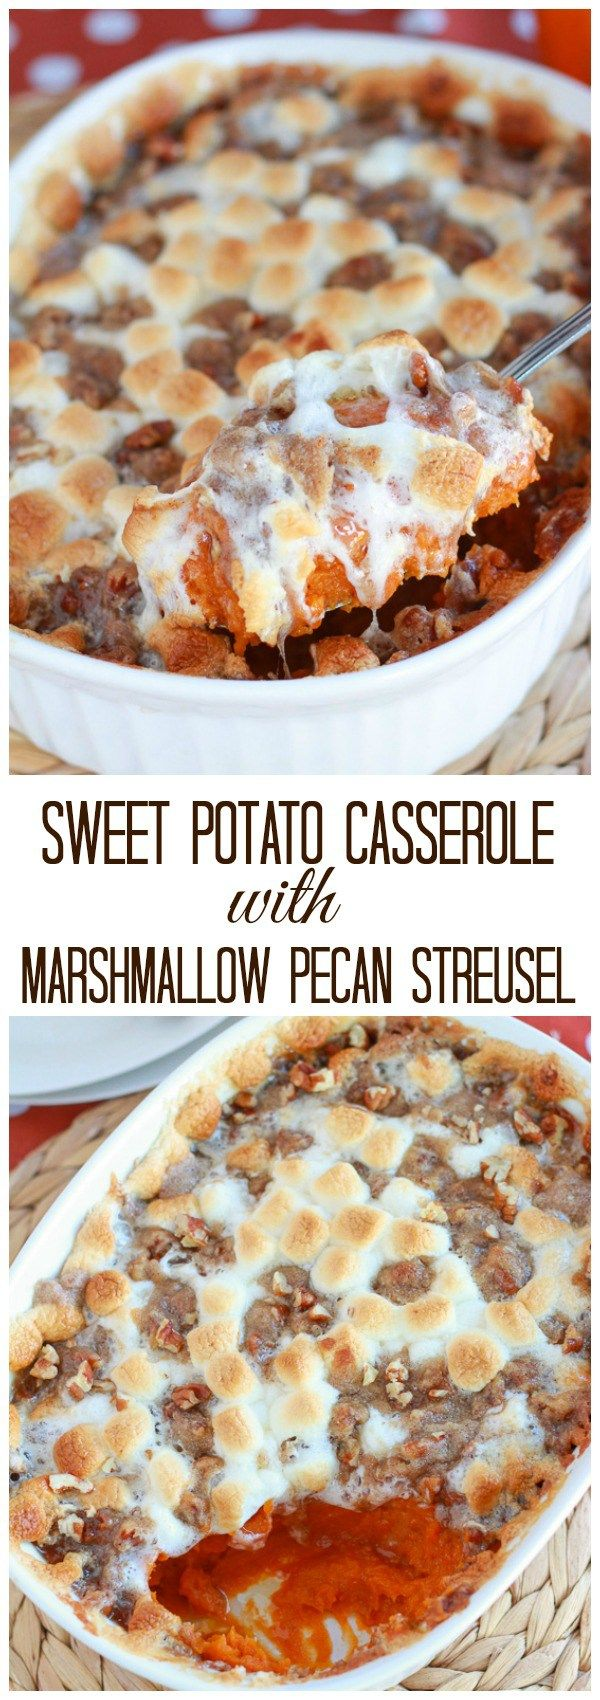 Sweet Potato Casserole with Marshmallow Pecan Streusel